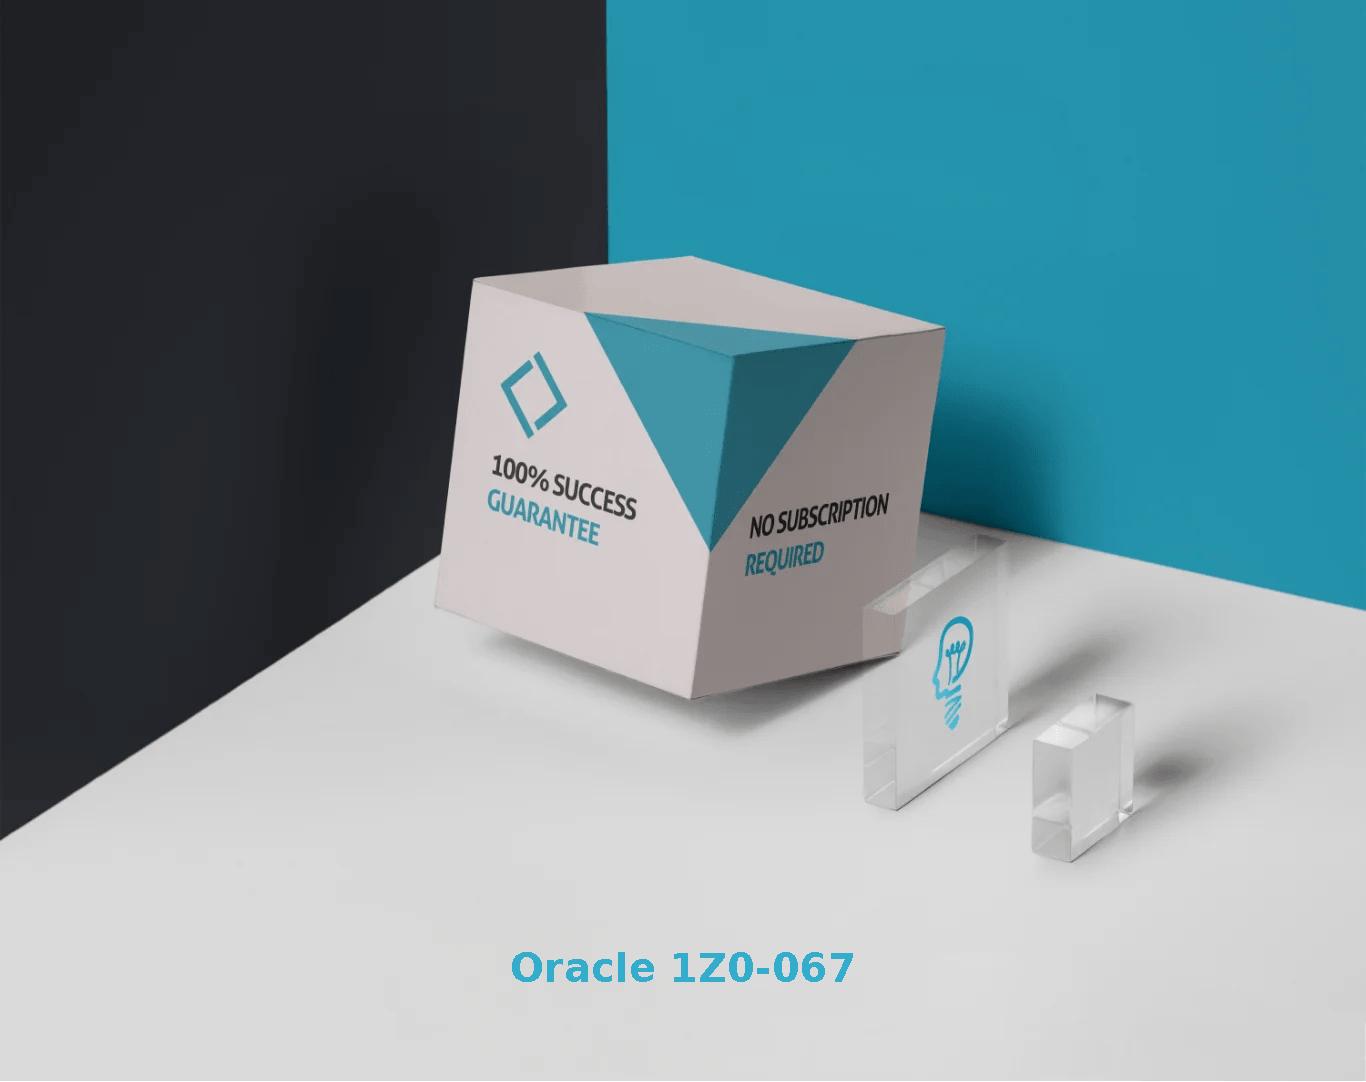 Oracle 1Z0-067 Exams